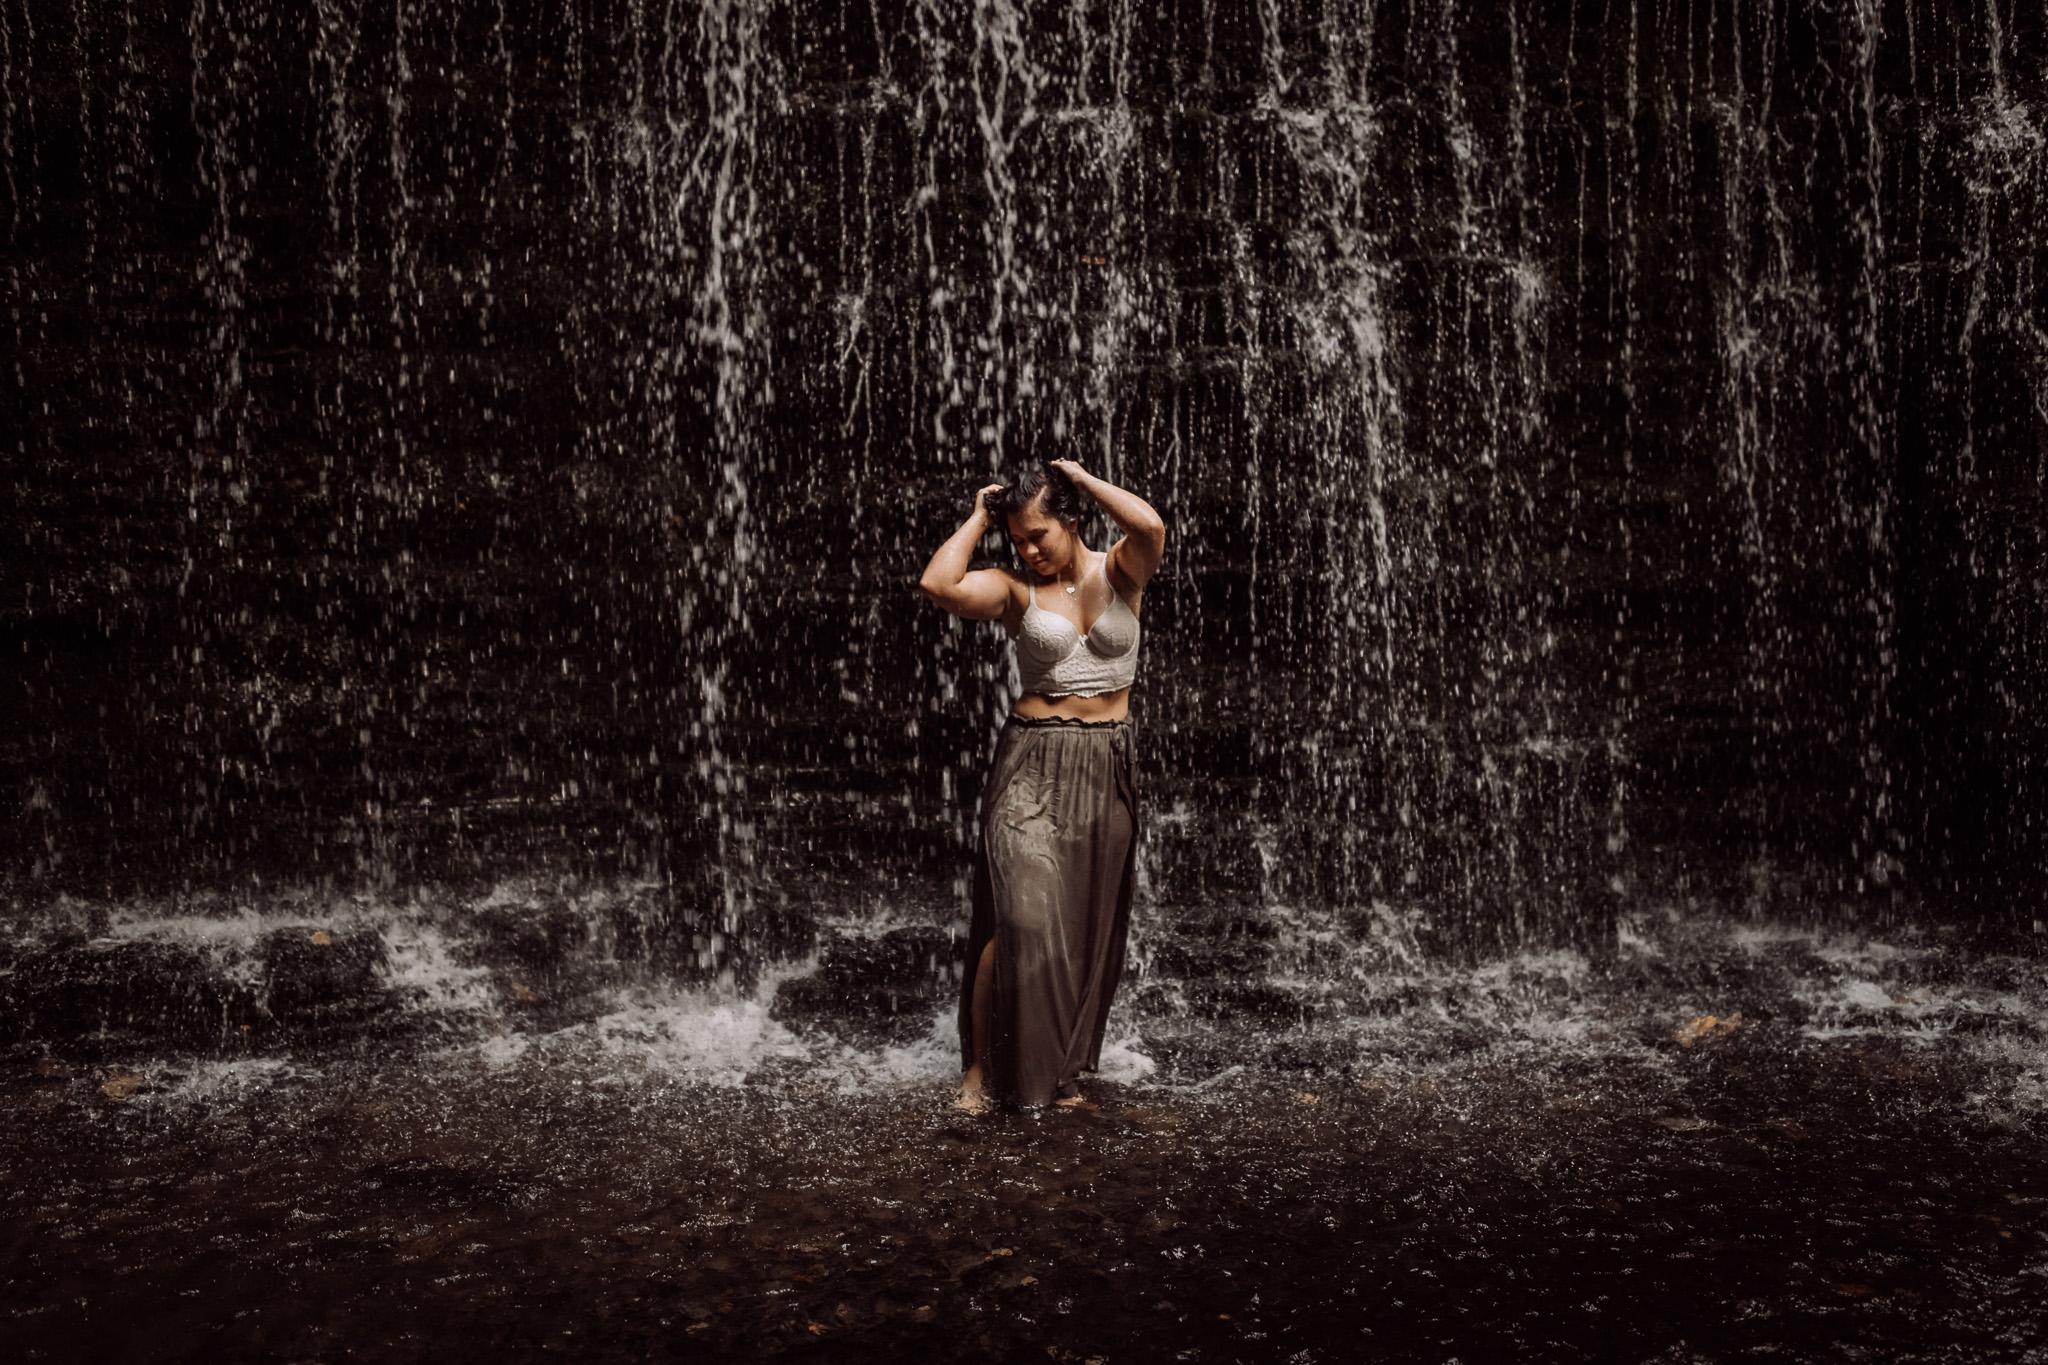 standing in waterfall boudoir pose